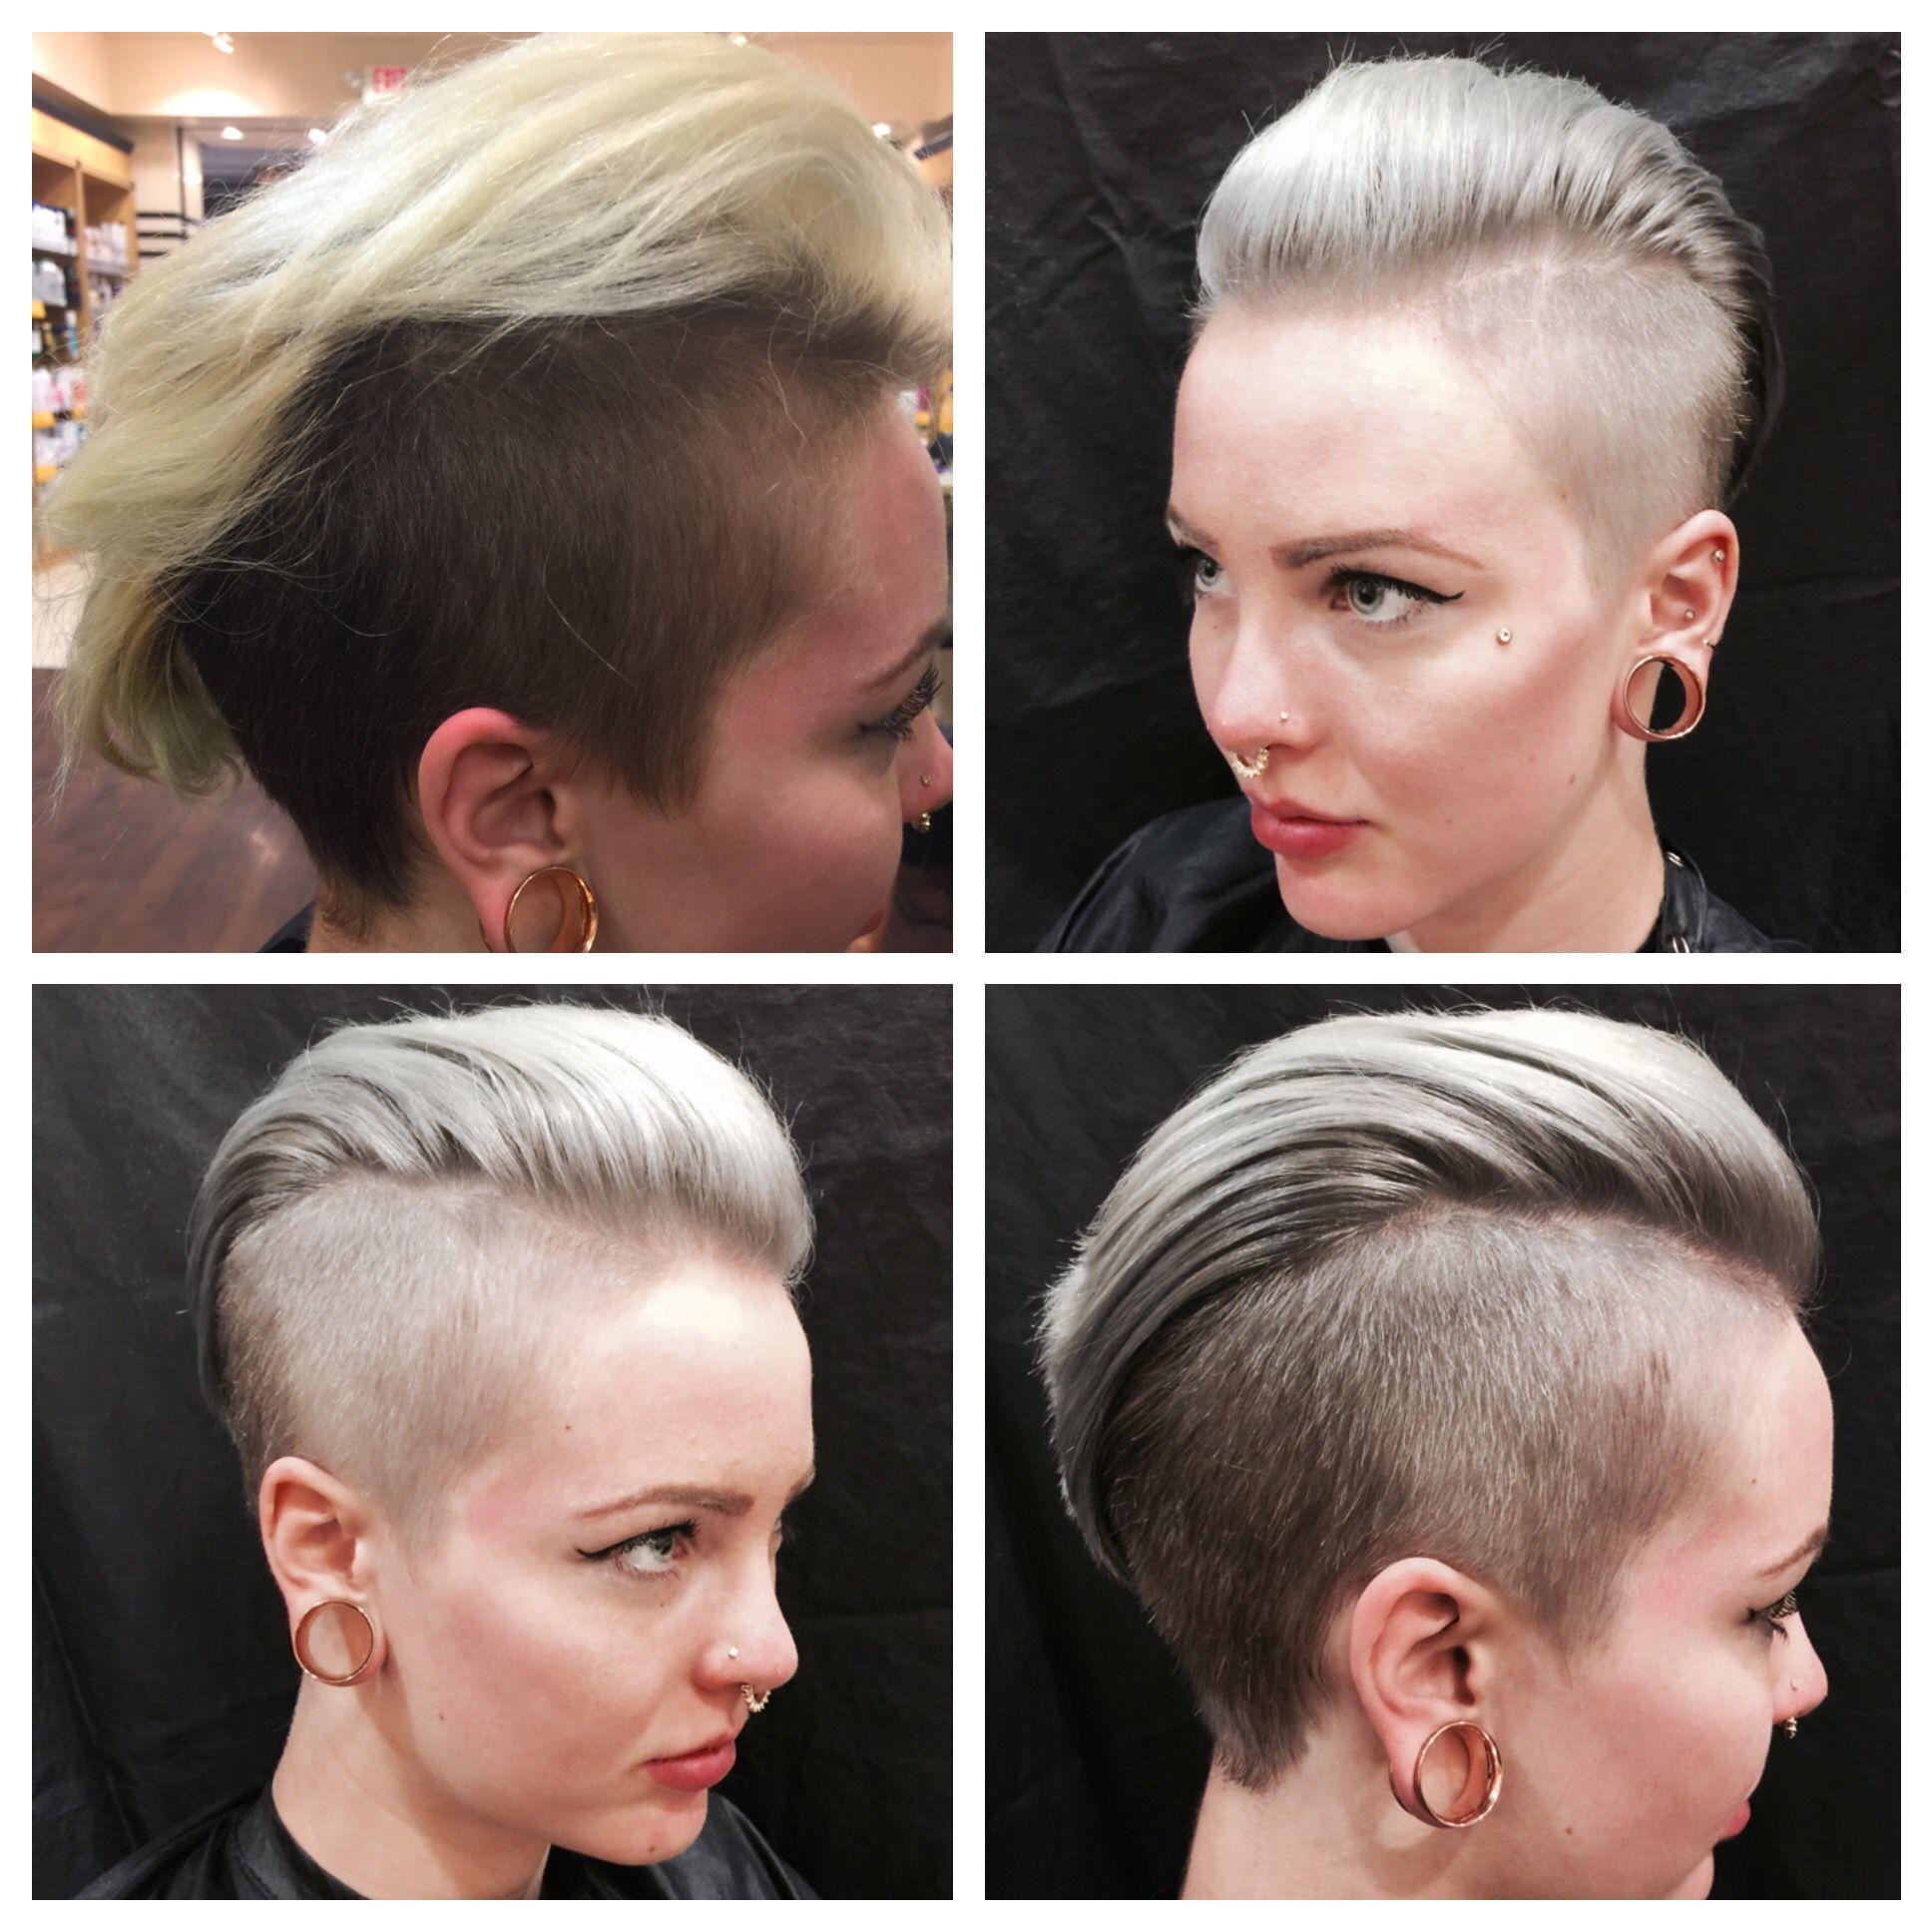 Siver hair by Terri at Mall of America Siver hair, Hair